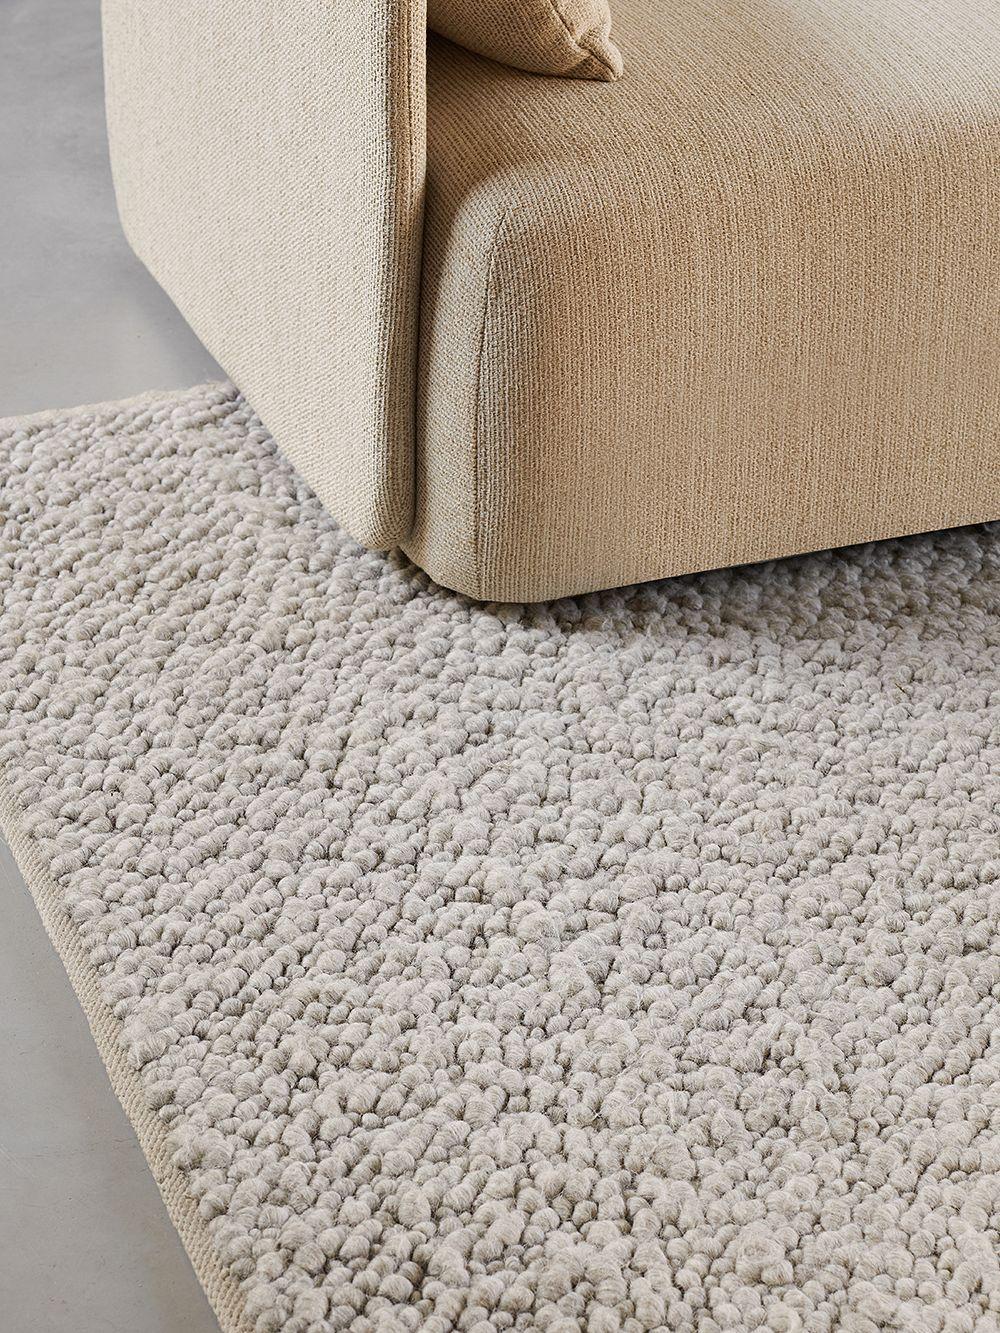 Menu Gravel rug, 170 x 200 cm, ivory